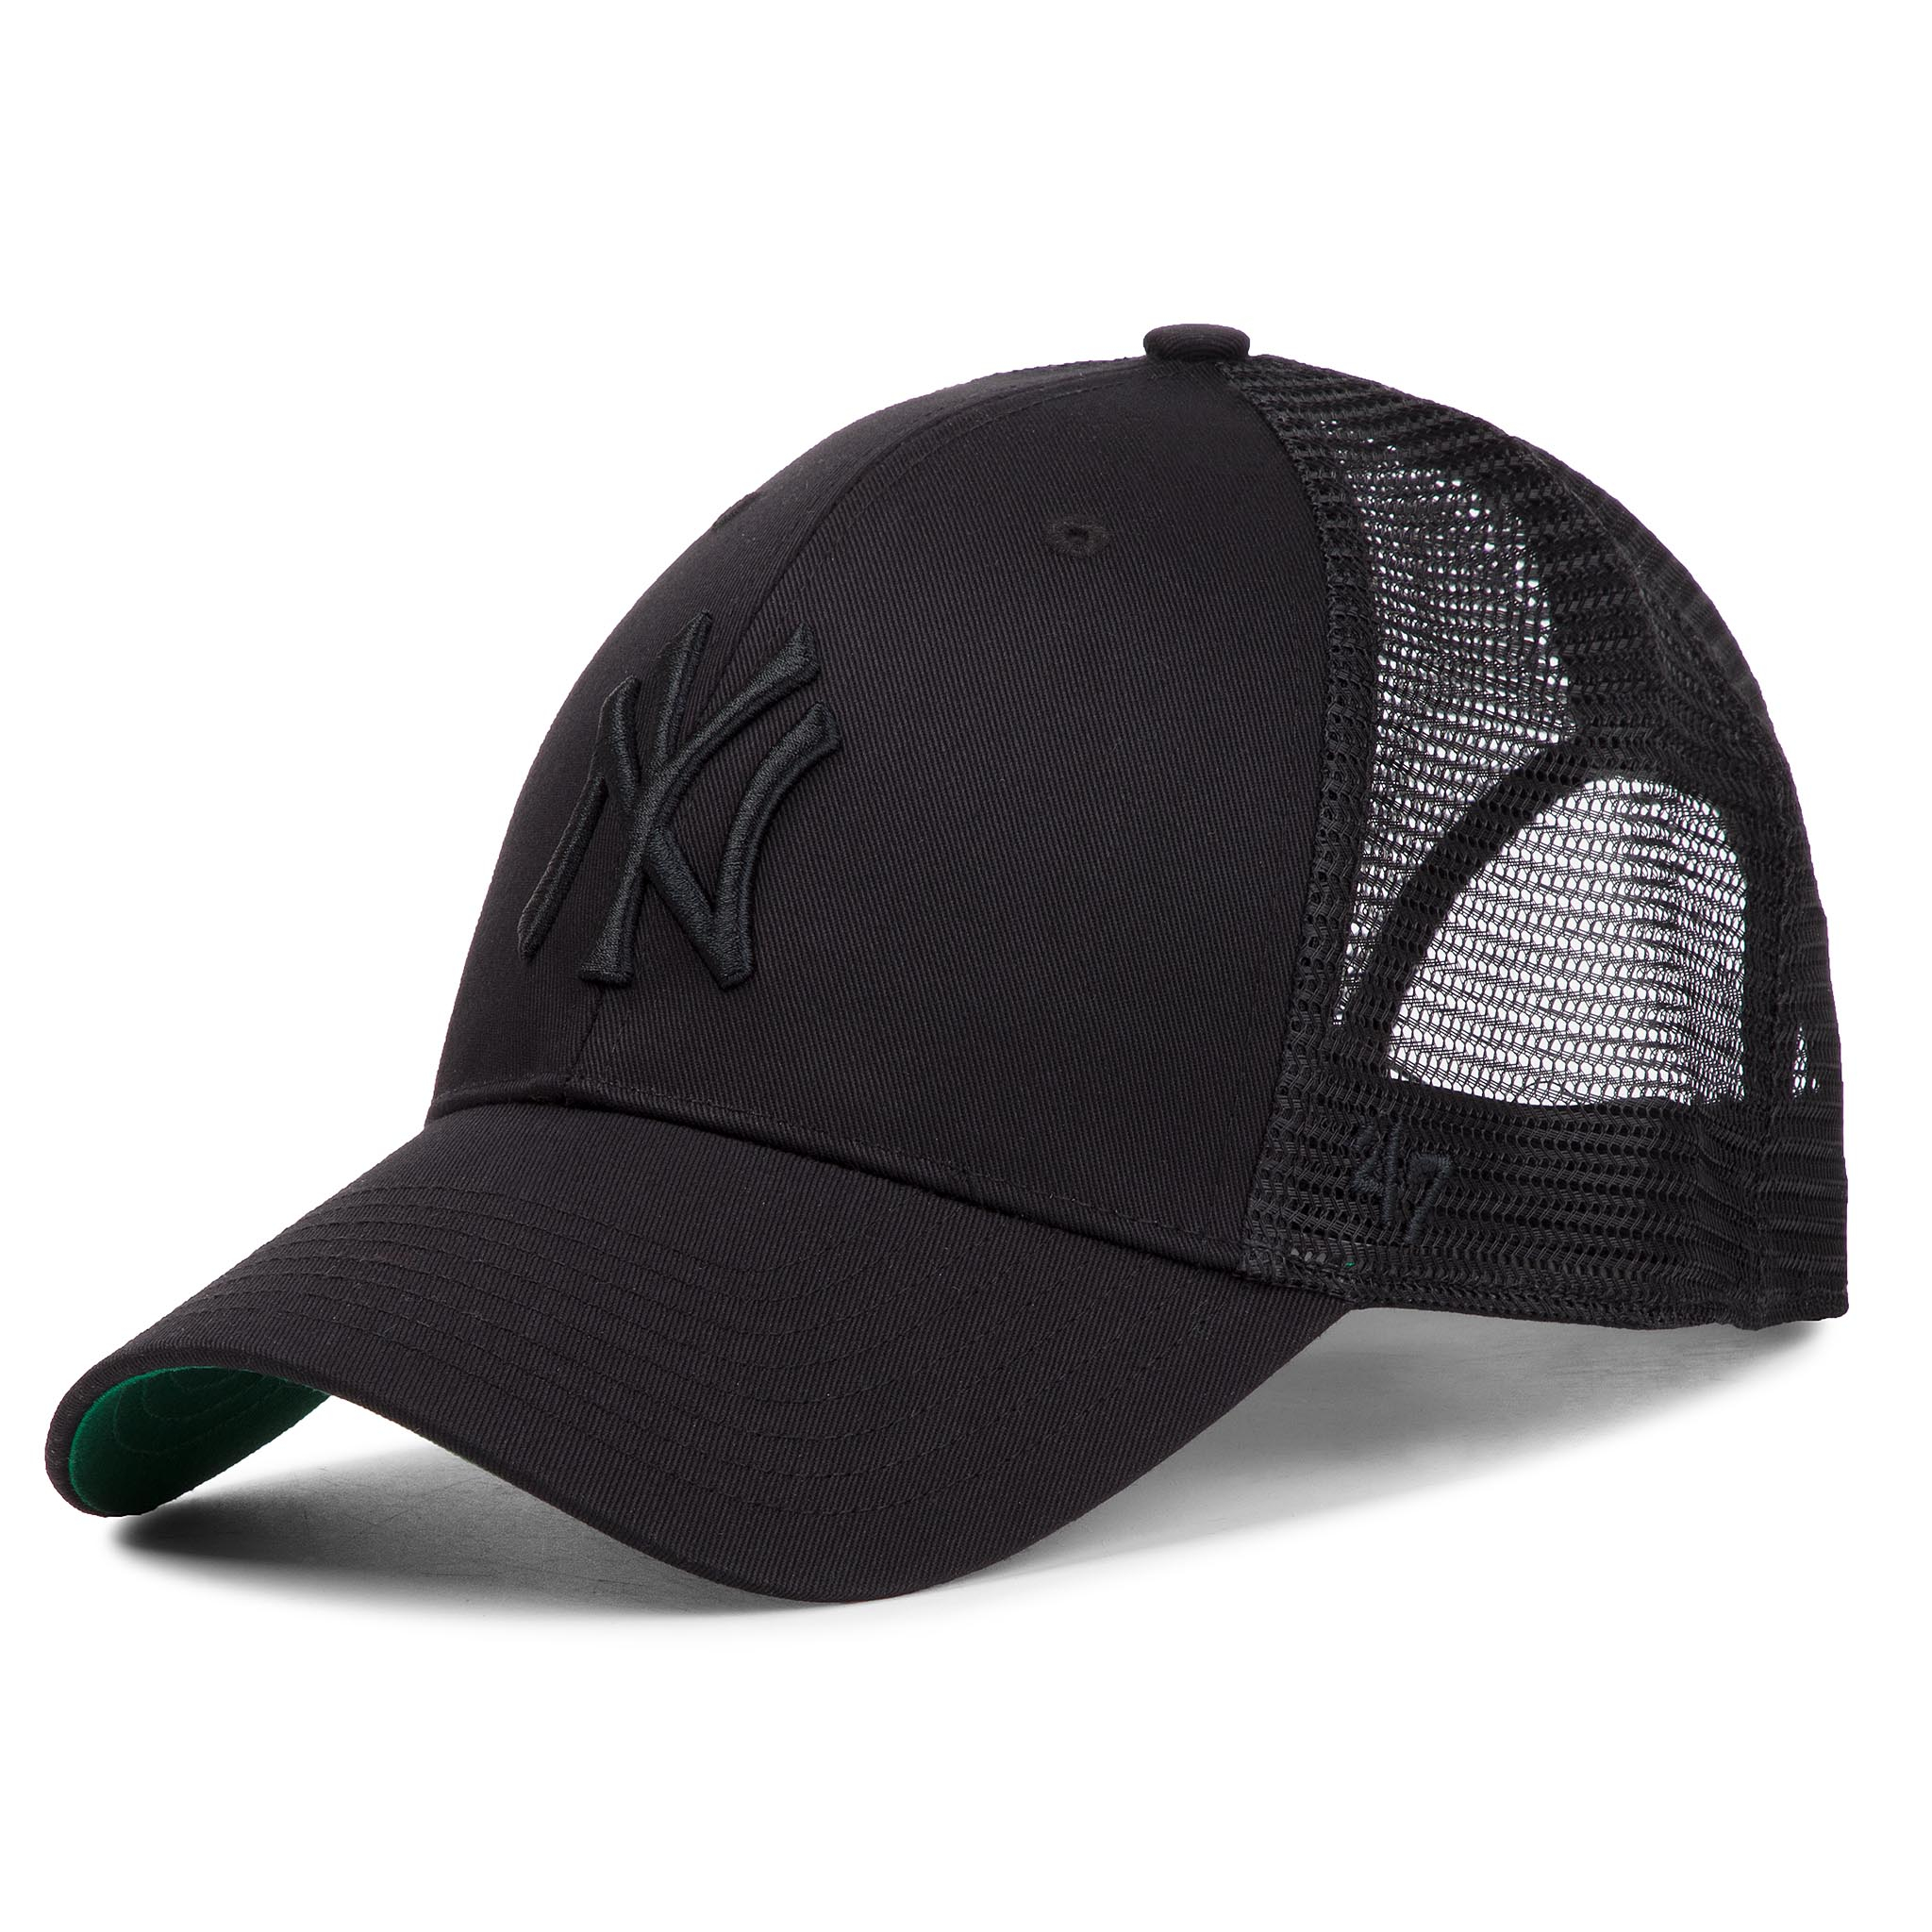 Image of Cap 47 BRAND - New York Yankees B-BRANS17CTP-BKB Black